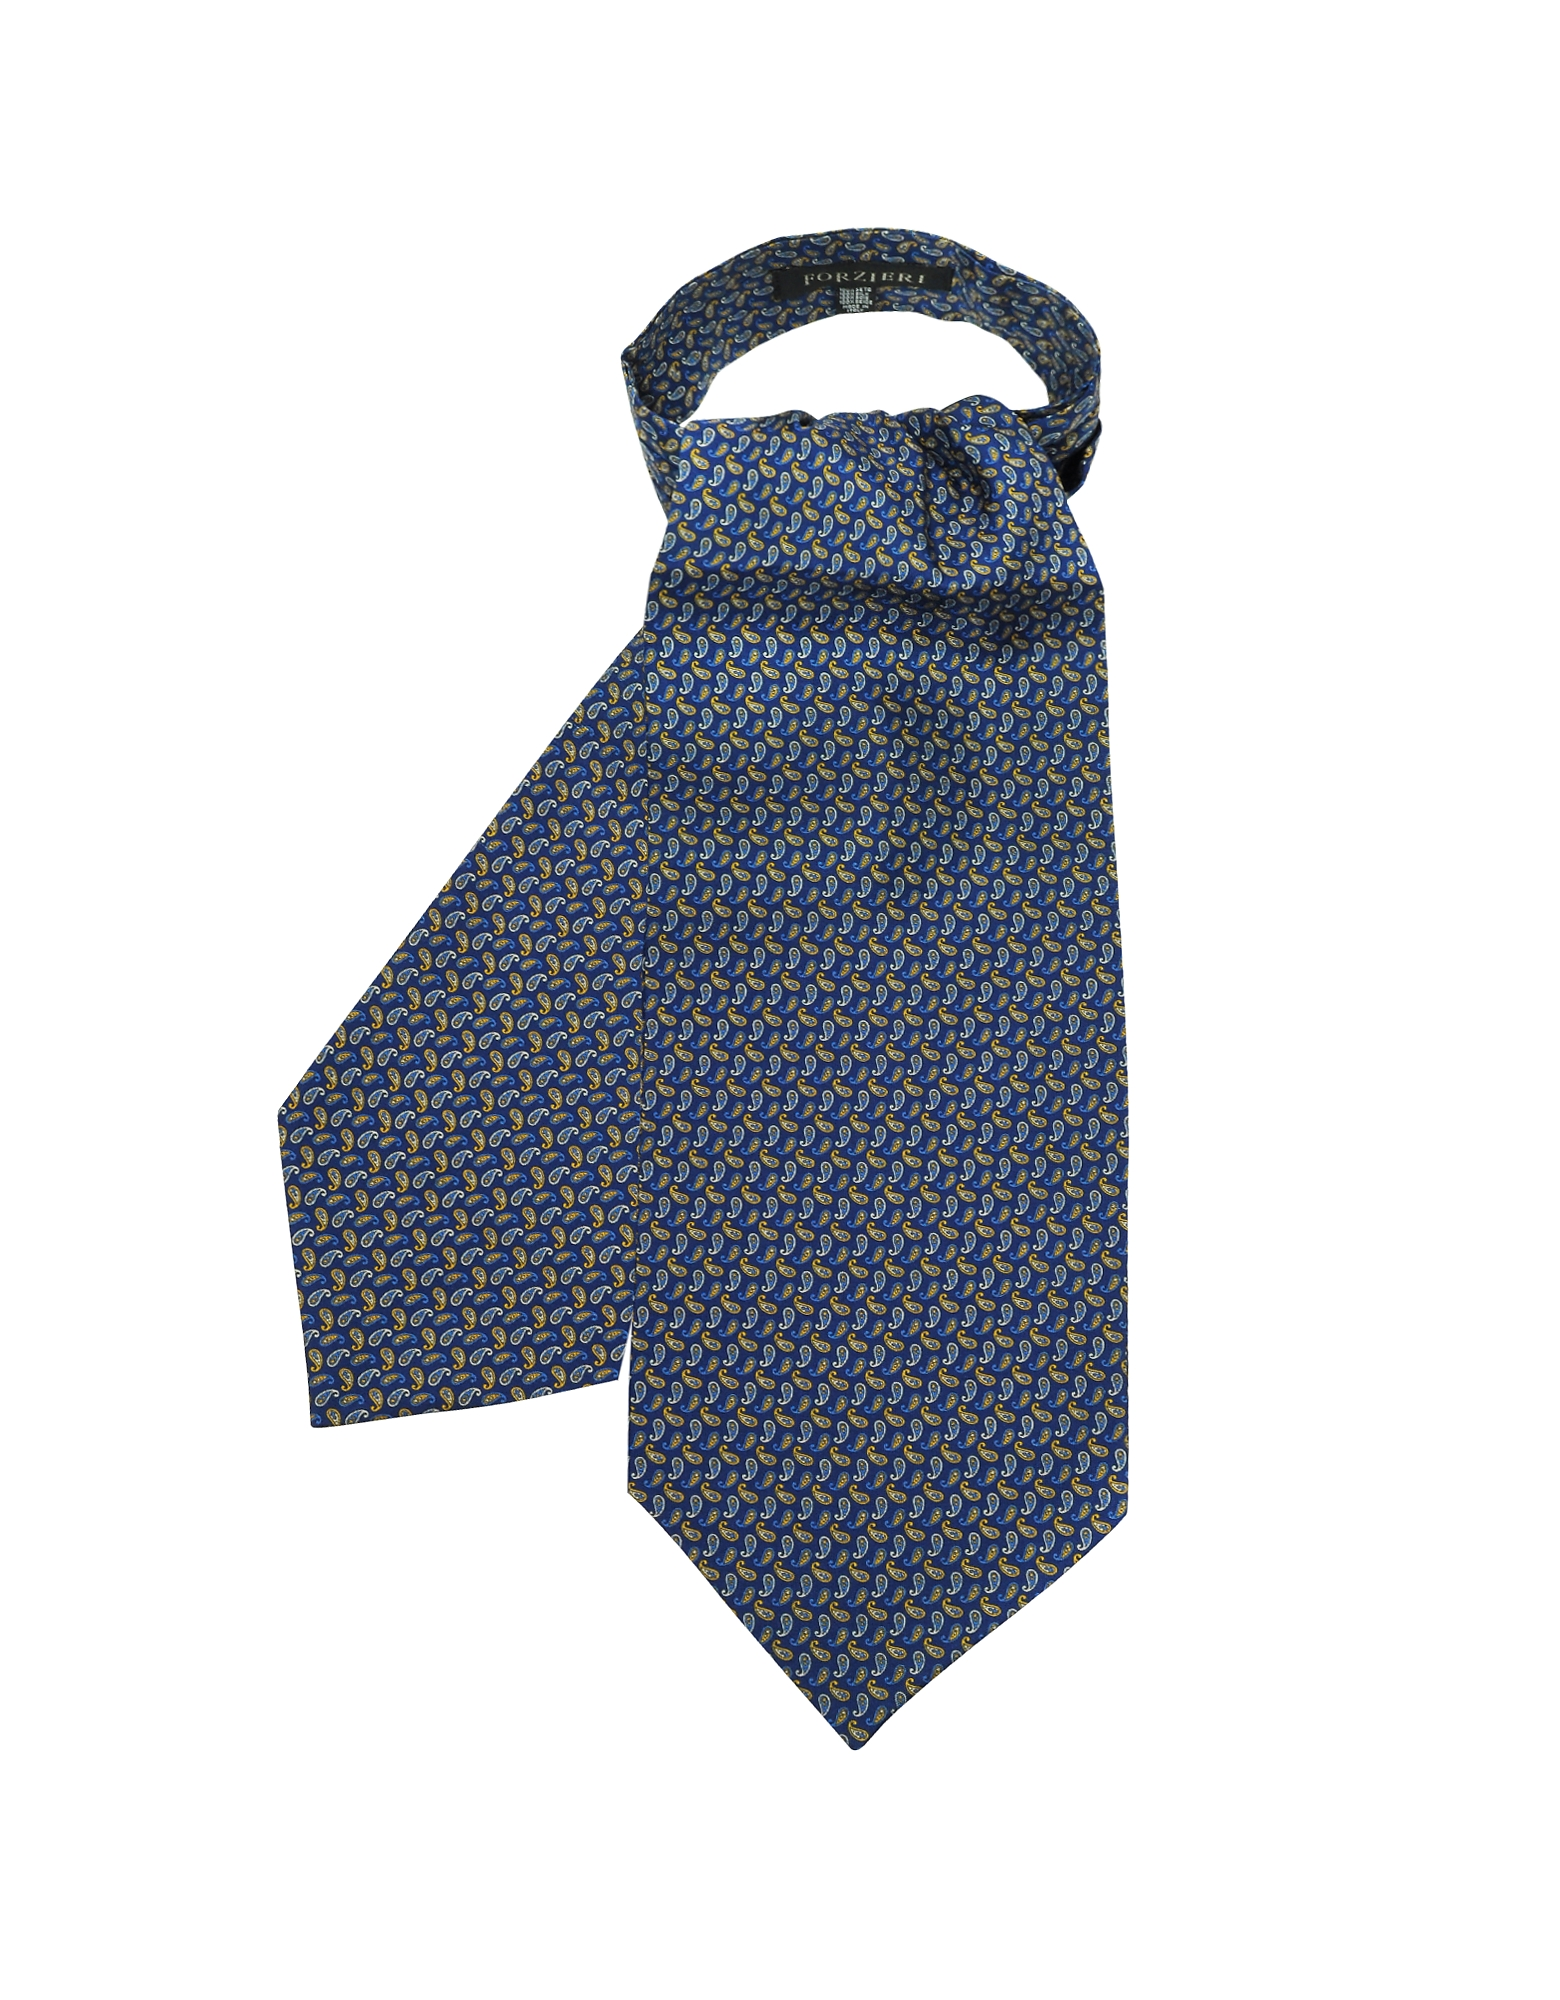 Forzieri Designer Ascot ties, Blue & Yellow Paisley Printed Twill Silk Ascot Tie